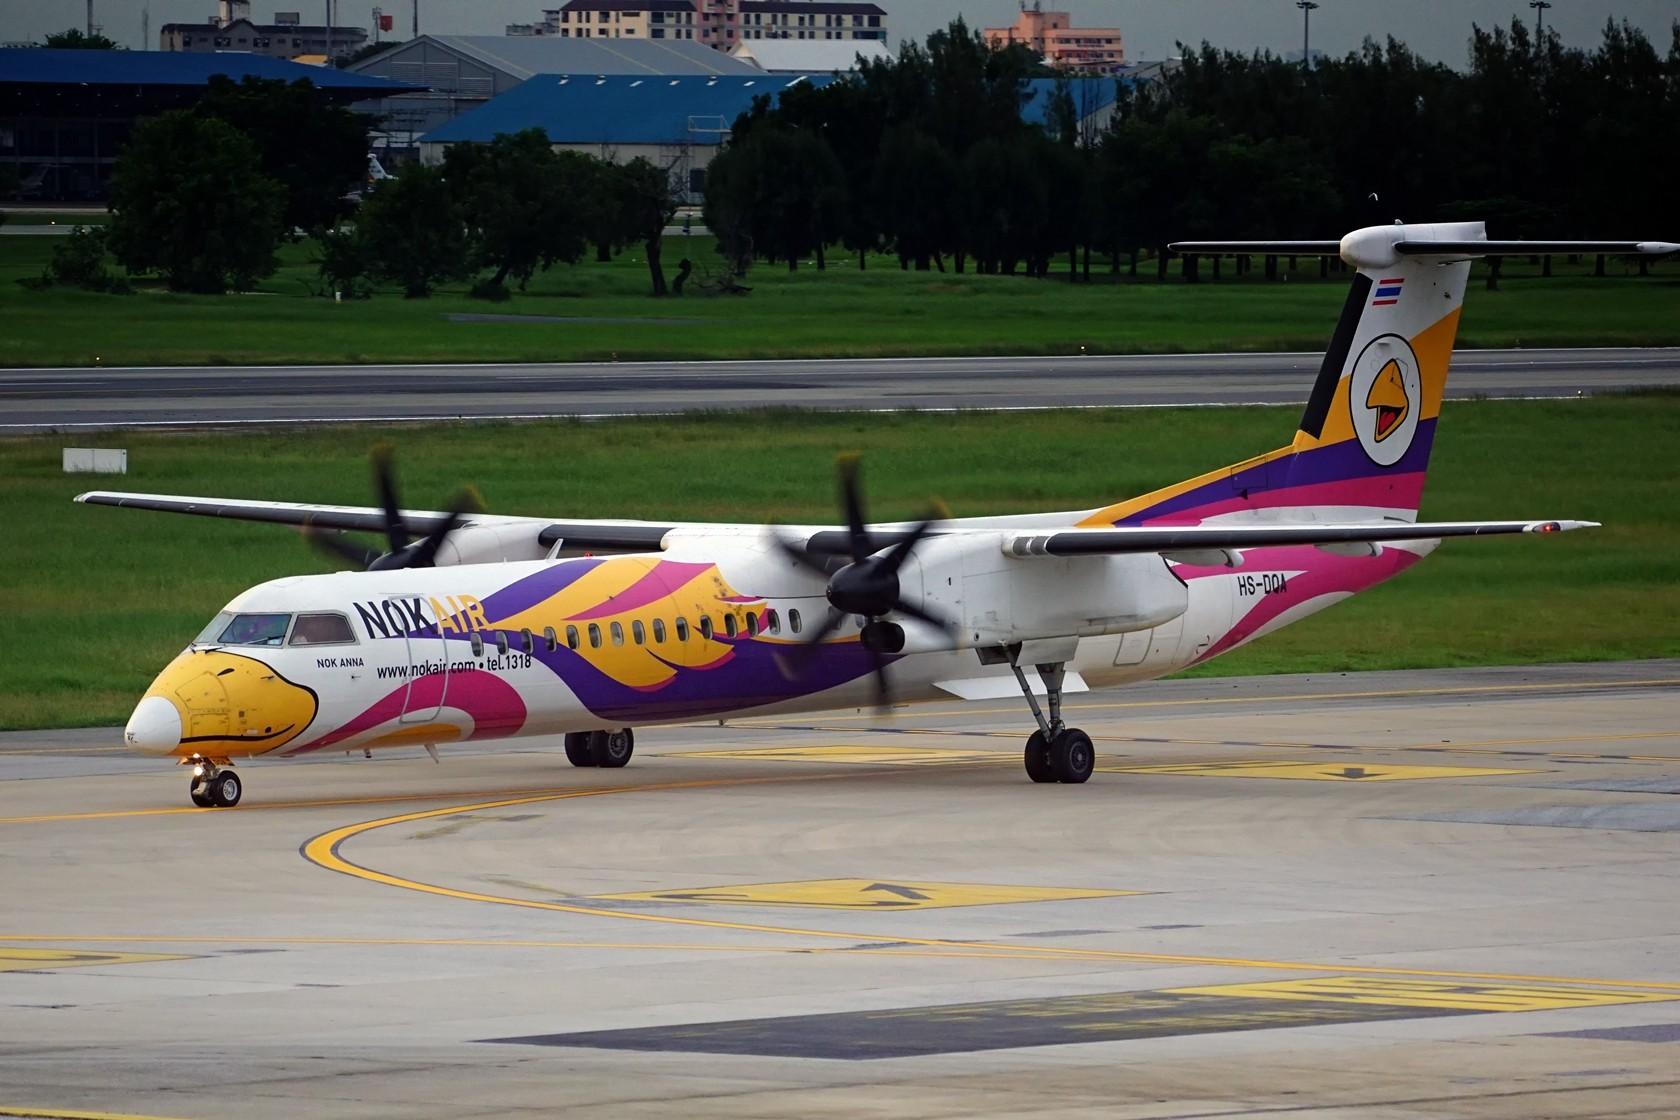 nokaie 皇雀航空 不说别的 就问你萌不萌 DE HAVILLAN CANADA DHC-8-400 HS-DQA 泰国曼谷廊曼国际机场